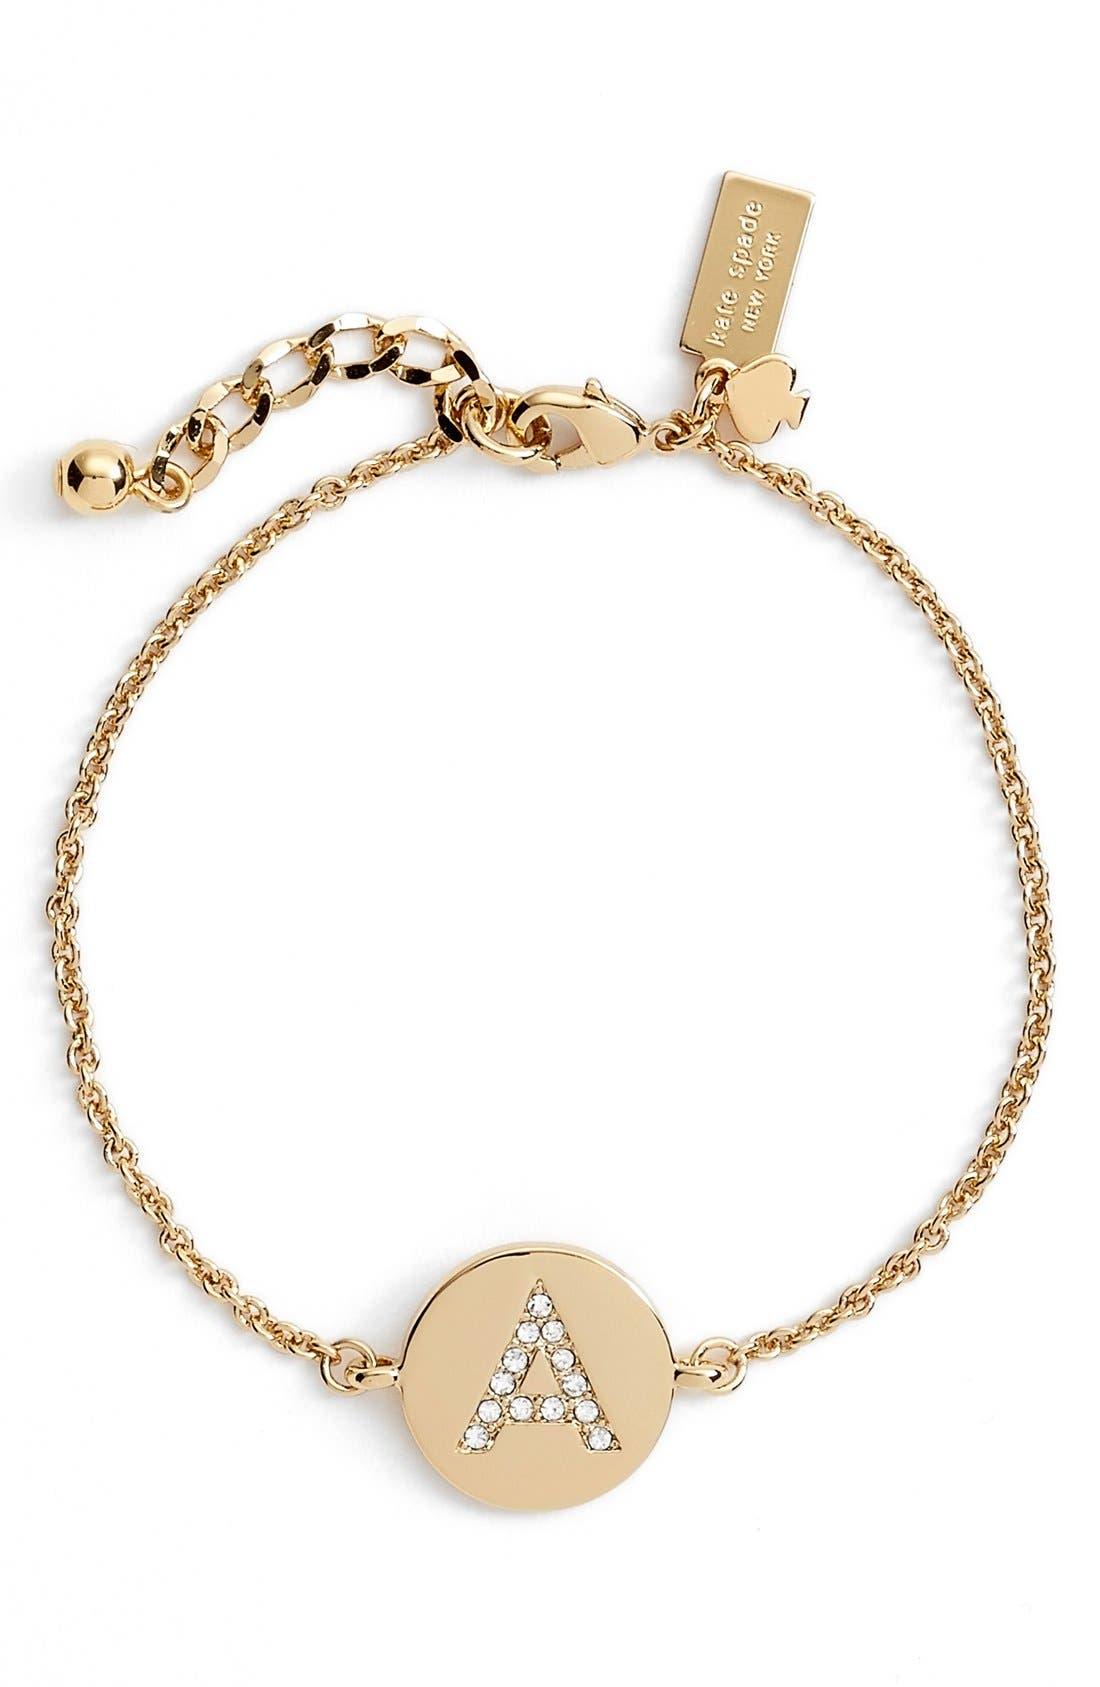 Main Image - kate spade new york 'north court' pavé initial charm bracelet